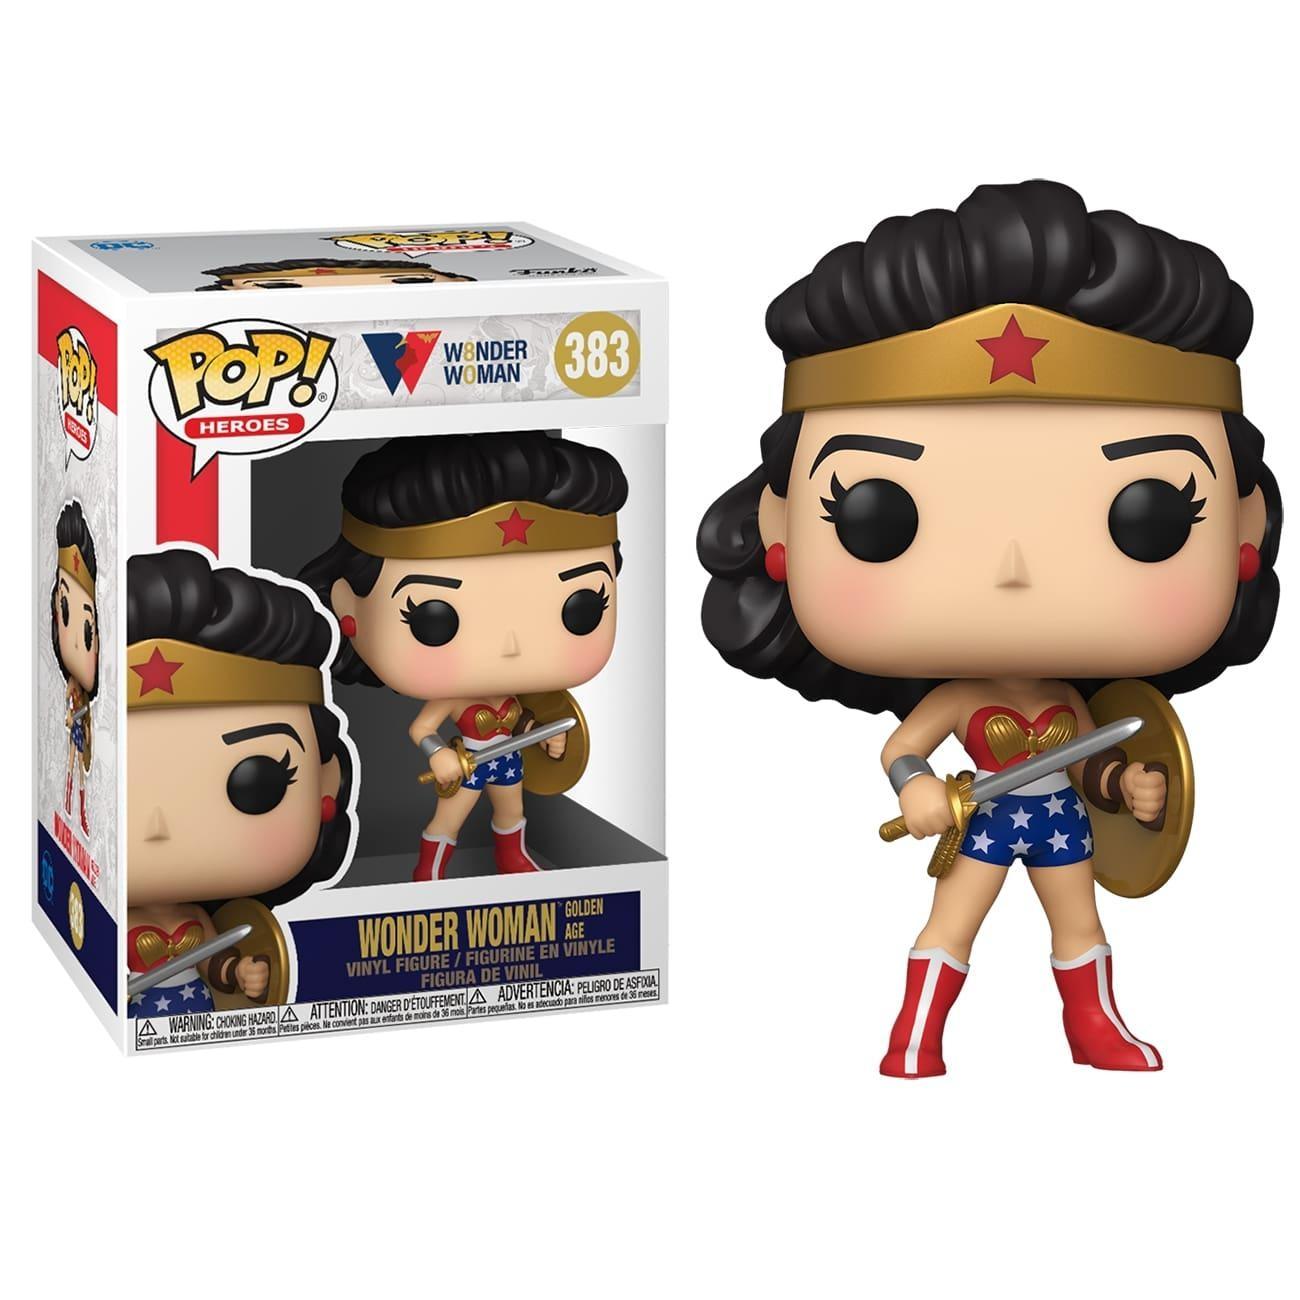 Funko Pop Wonder Woman 383 - DC